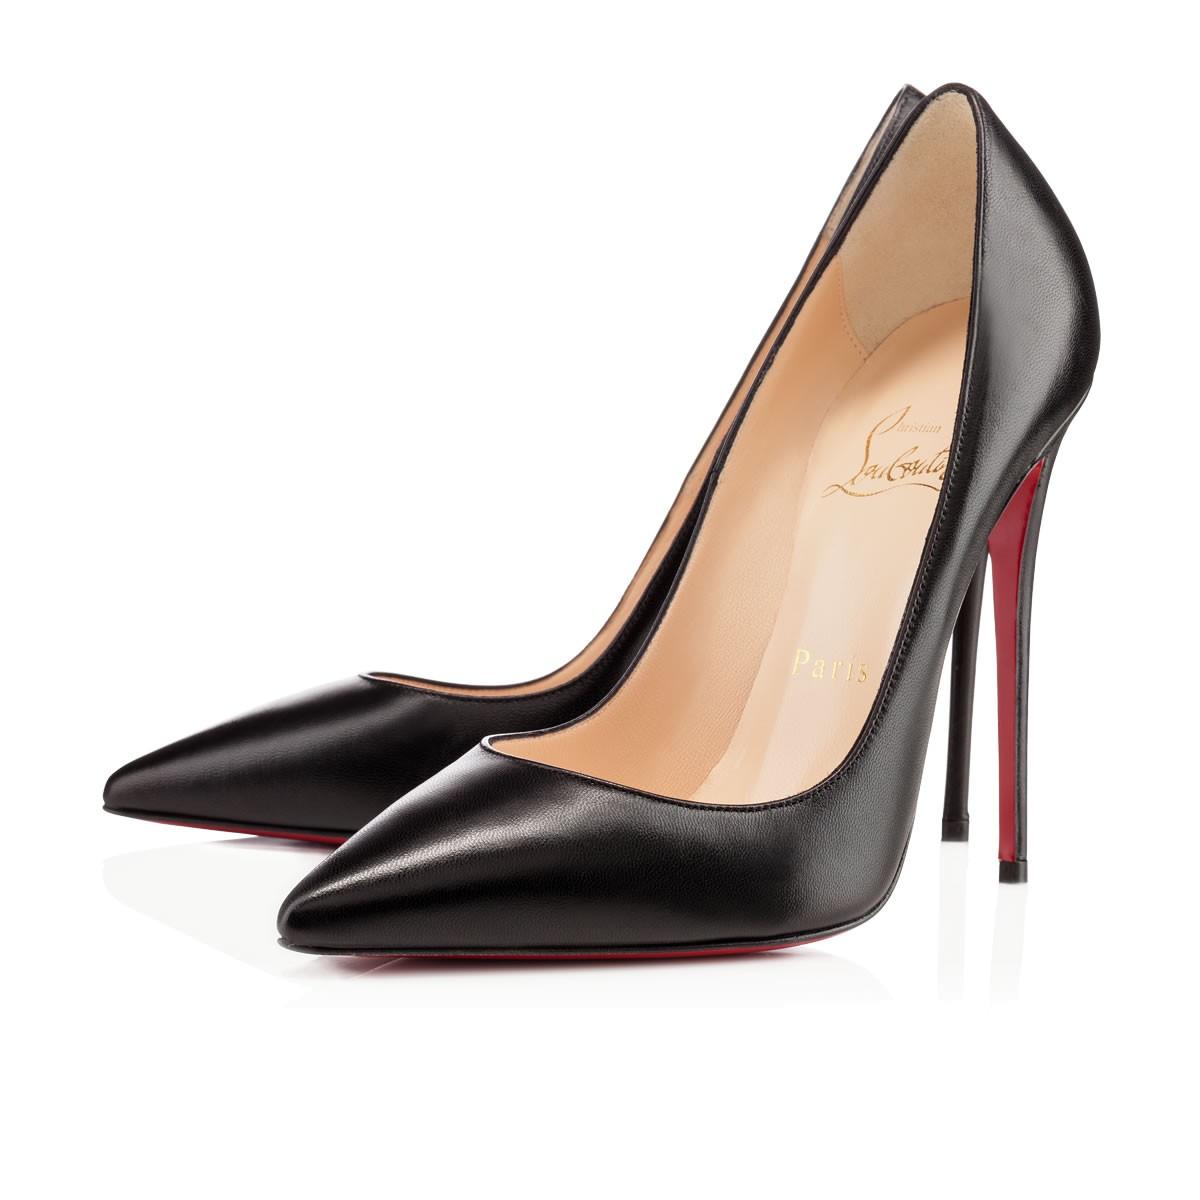 【已开奖】《时尚进阶班》百搭一件单品NO.2 Christian Louboutin 红底高跟鞋